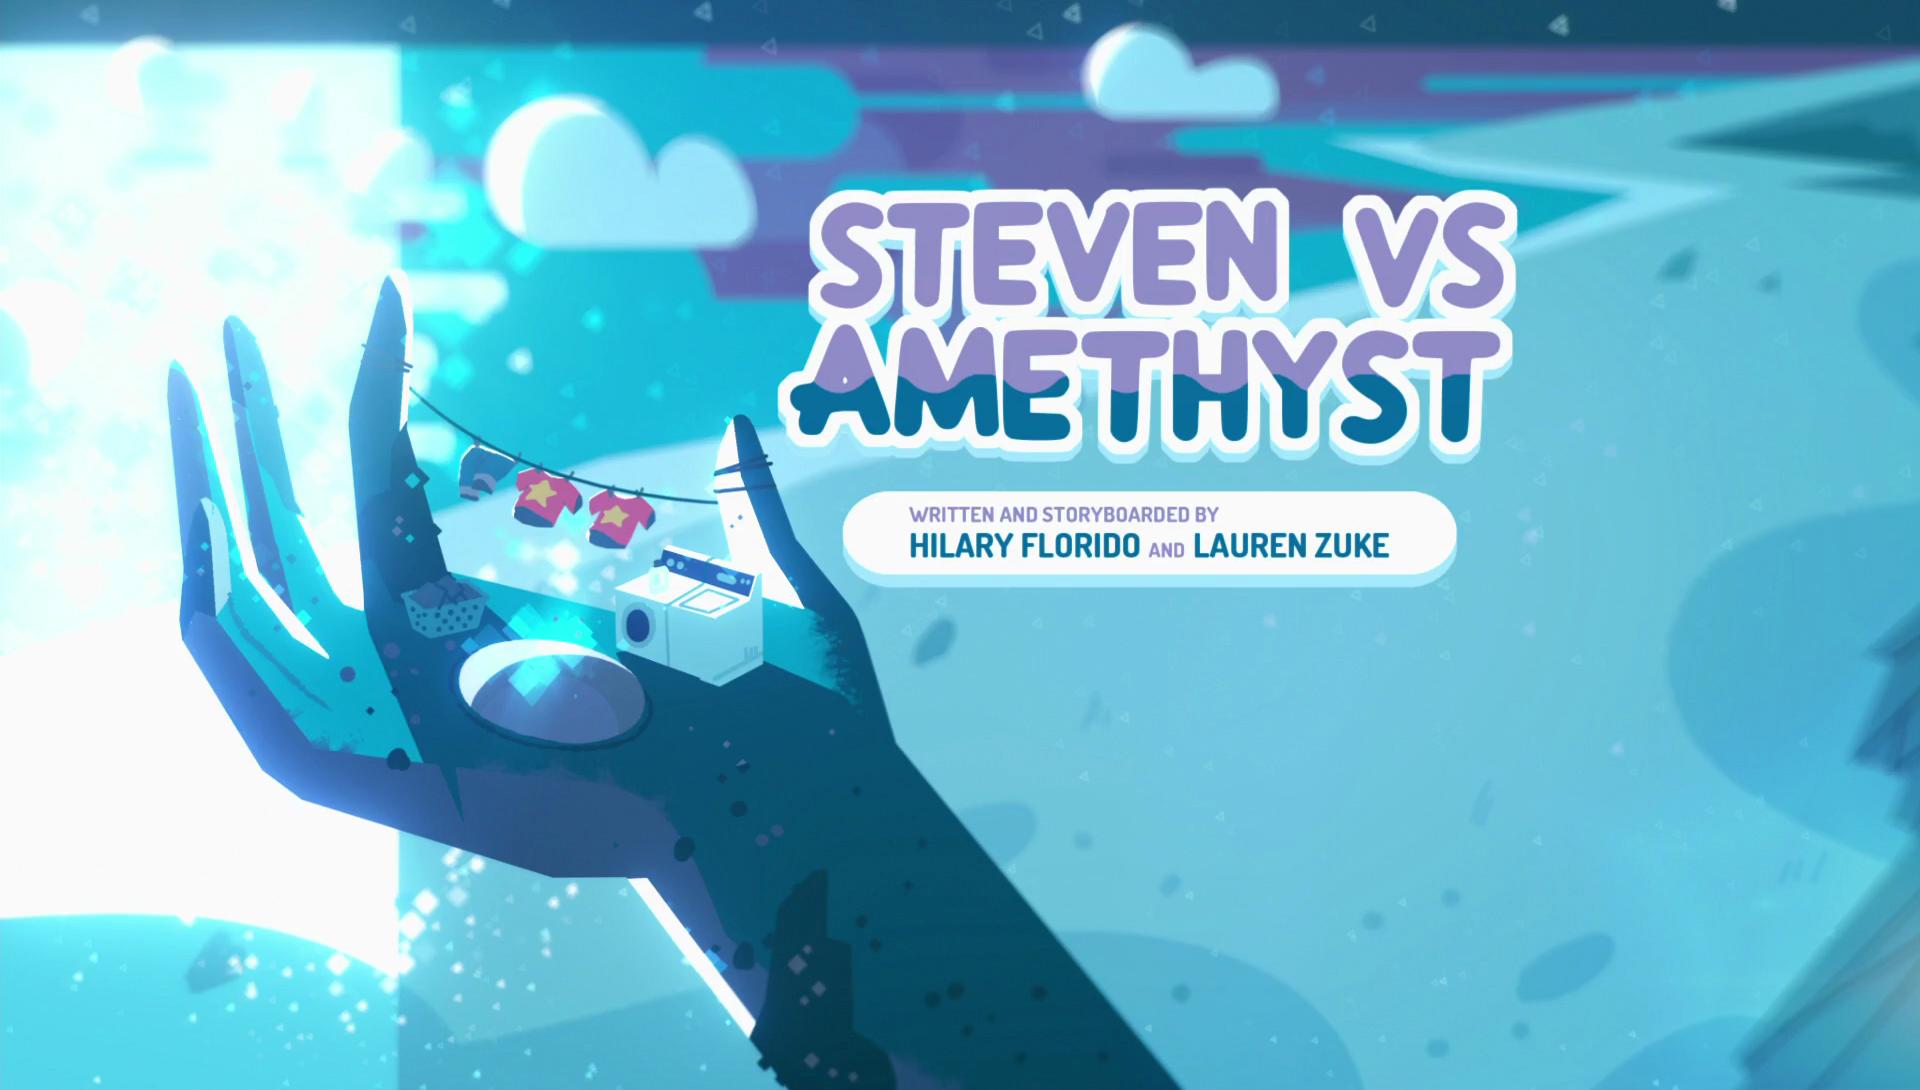 Steven vs. Amethyst